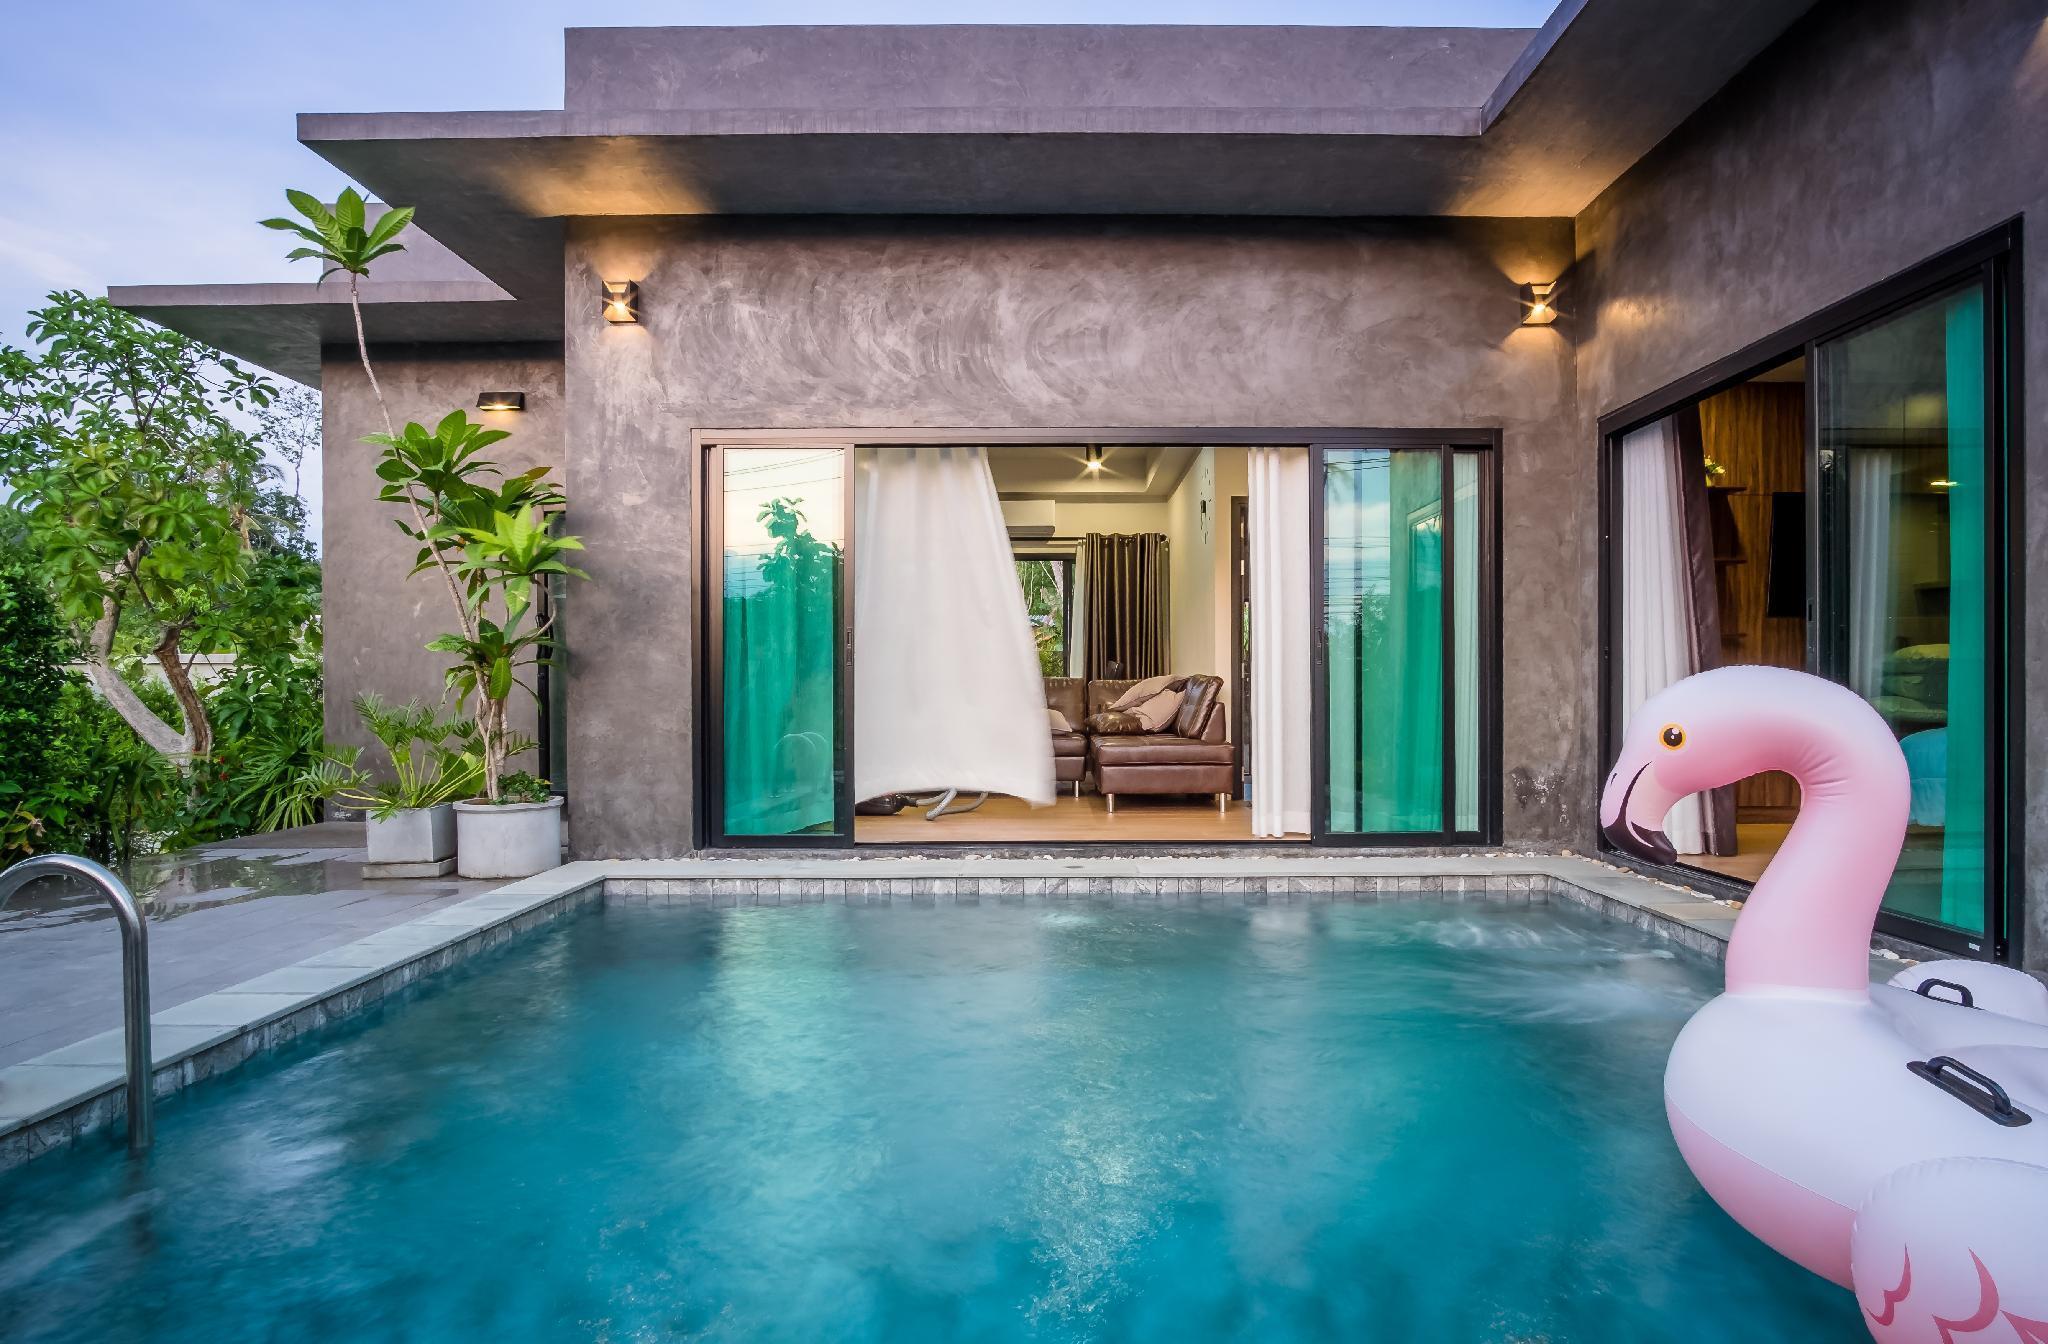 RAKSA private pool villa RAKSA private pool villa